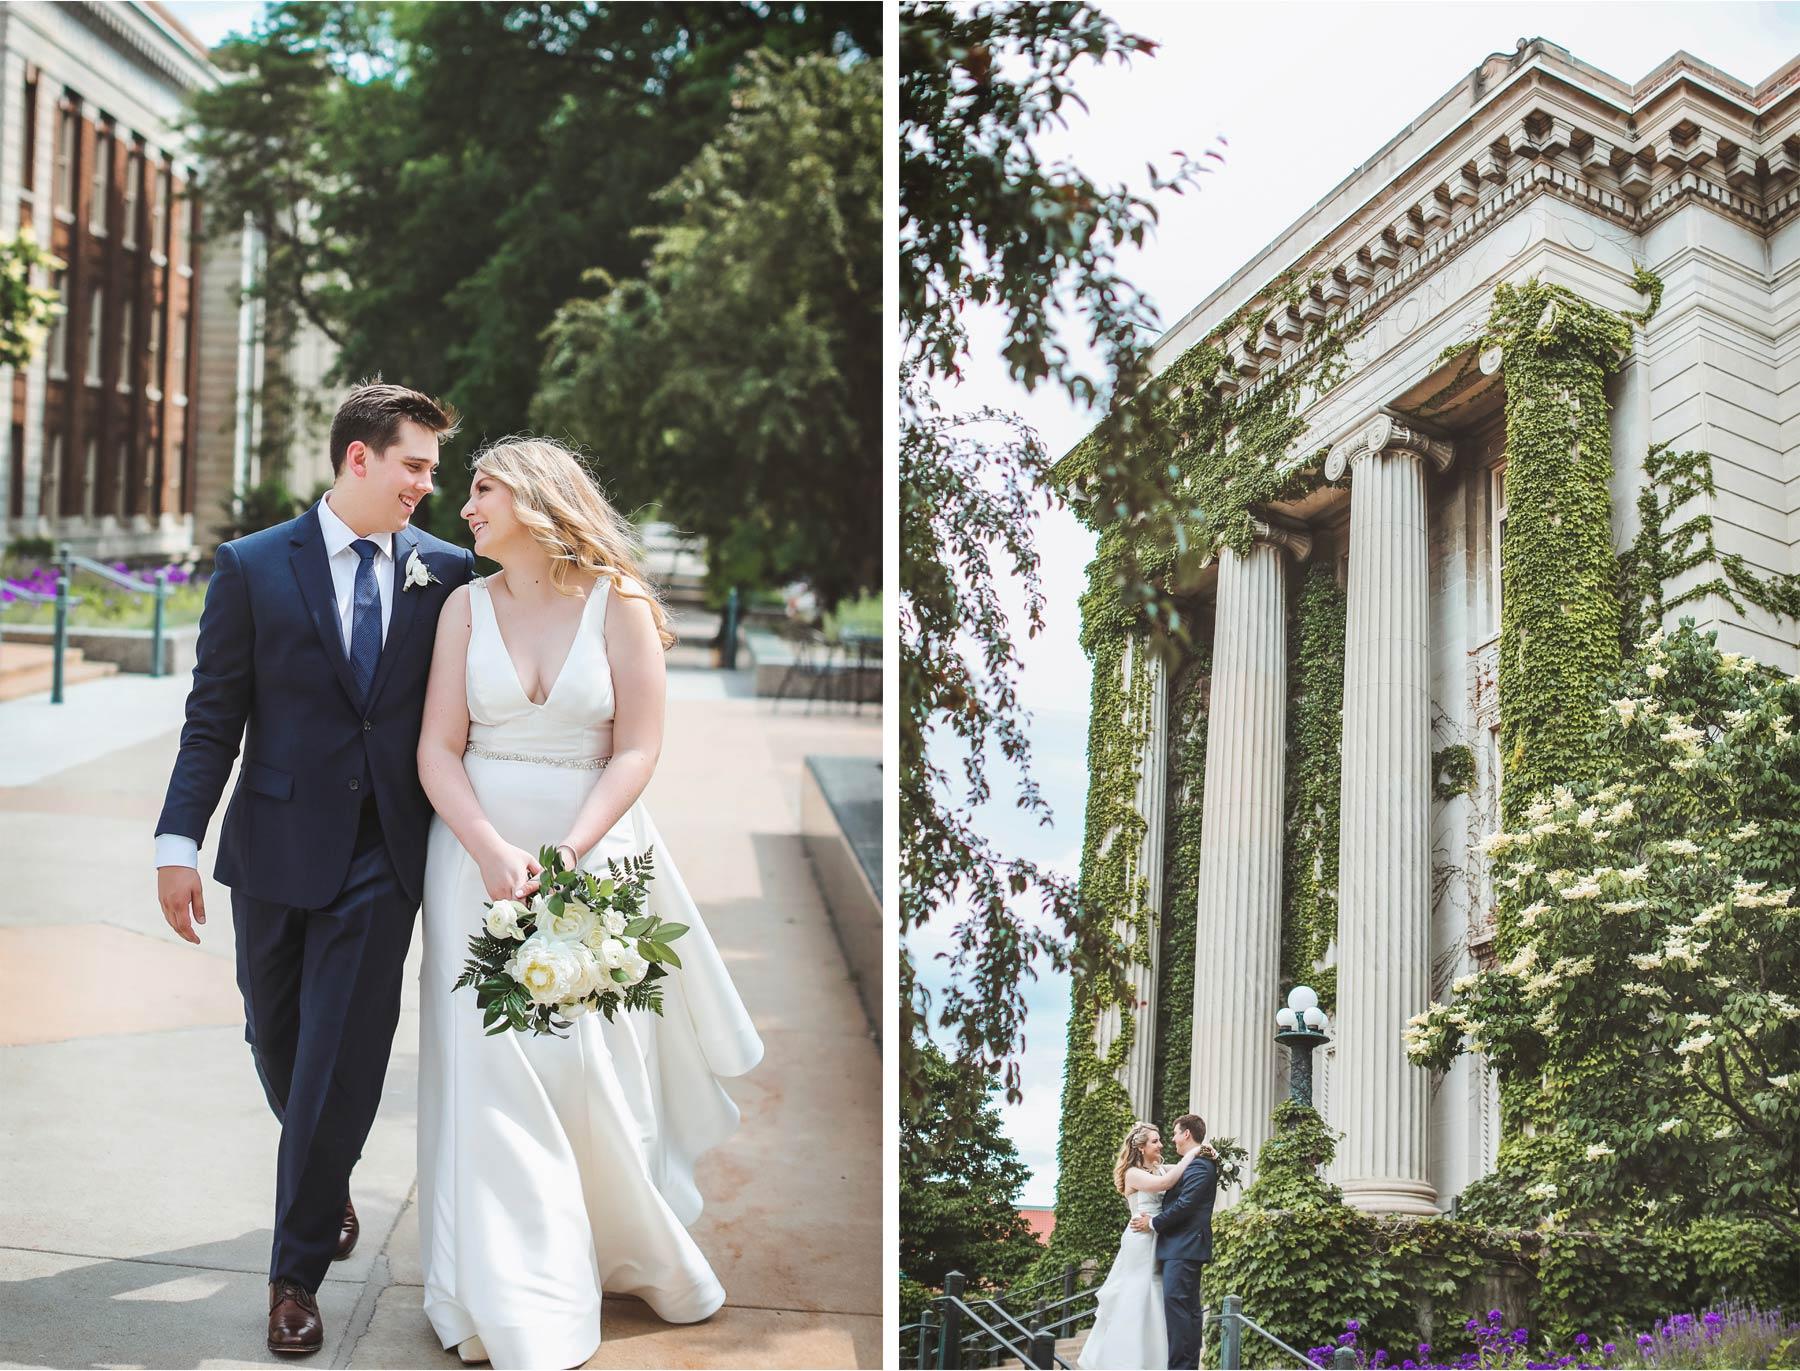 13-Minneapolis-Minnesota-Wedding-Vick-Photography-The-Depot-Bride-Groom-Amelia-and-Alexander.jpg